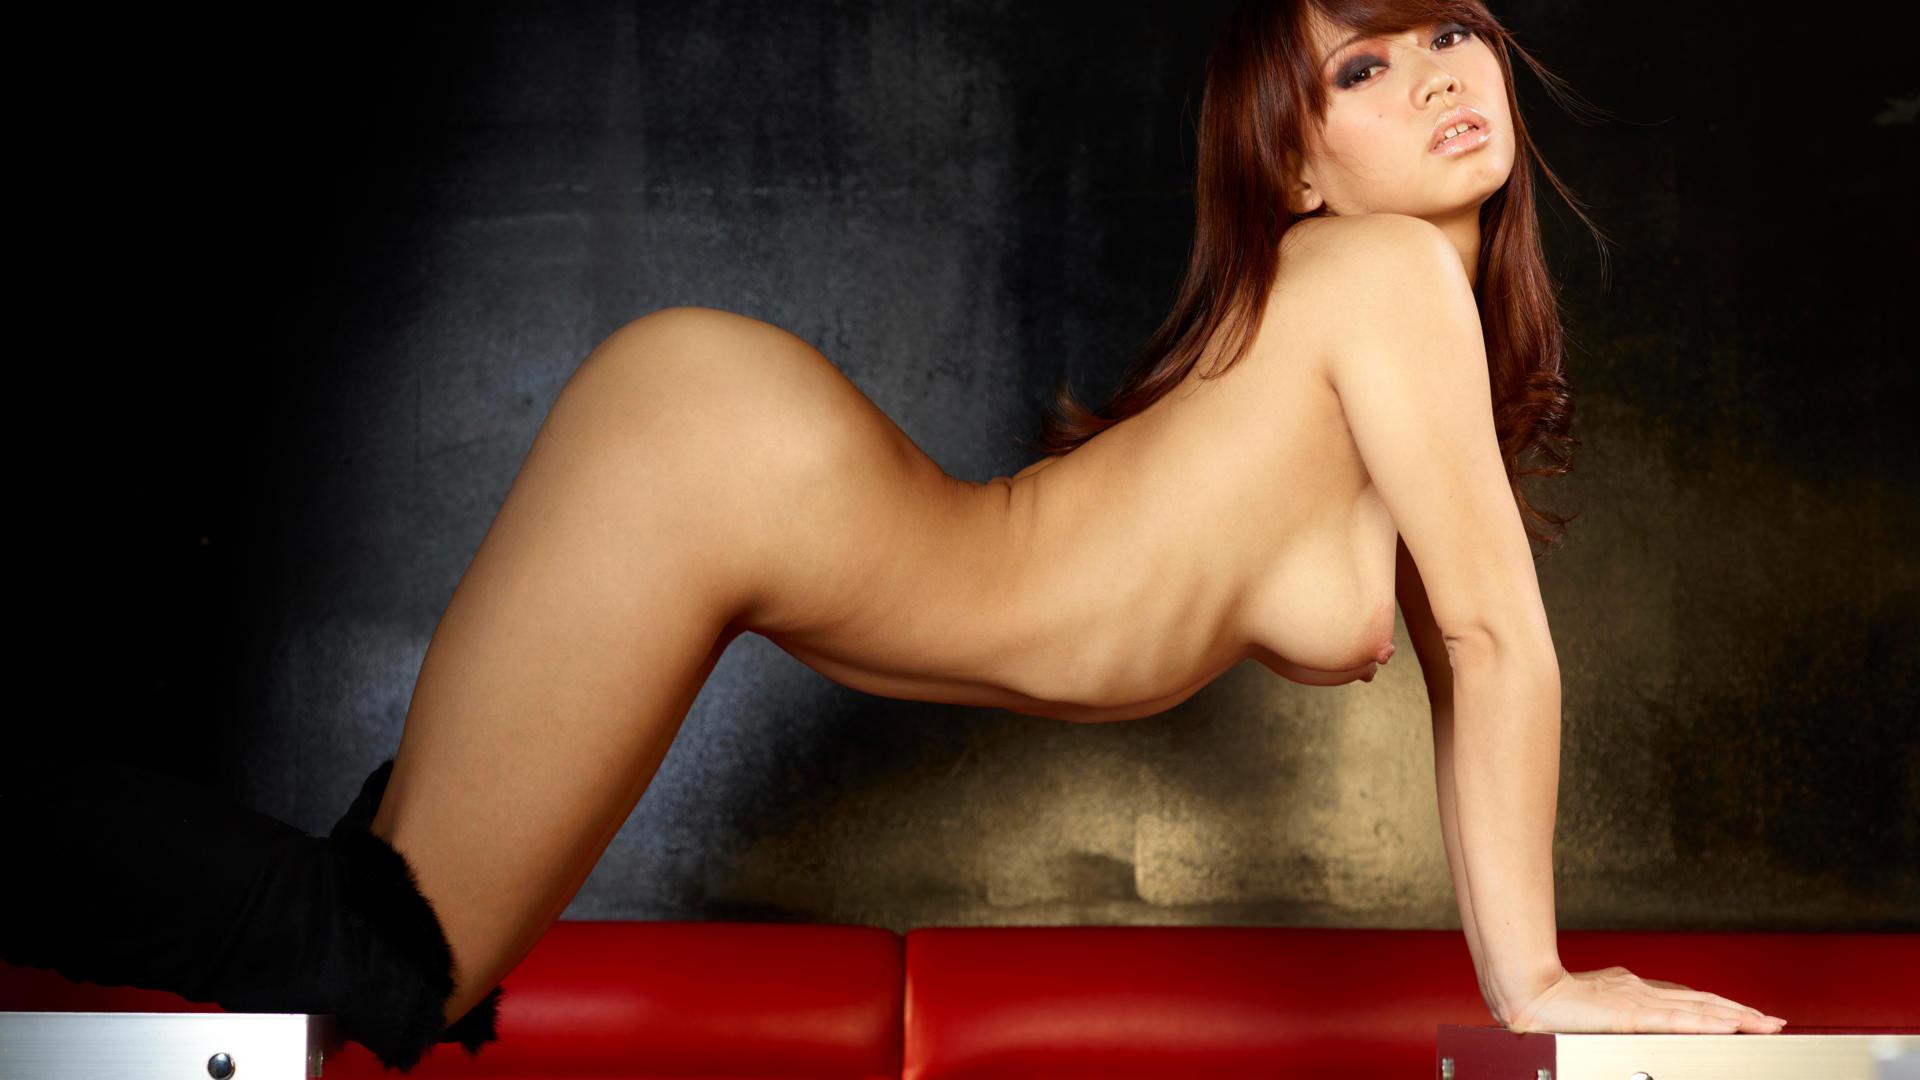 Sexy boobs in night club